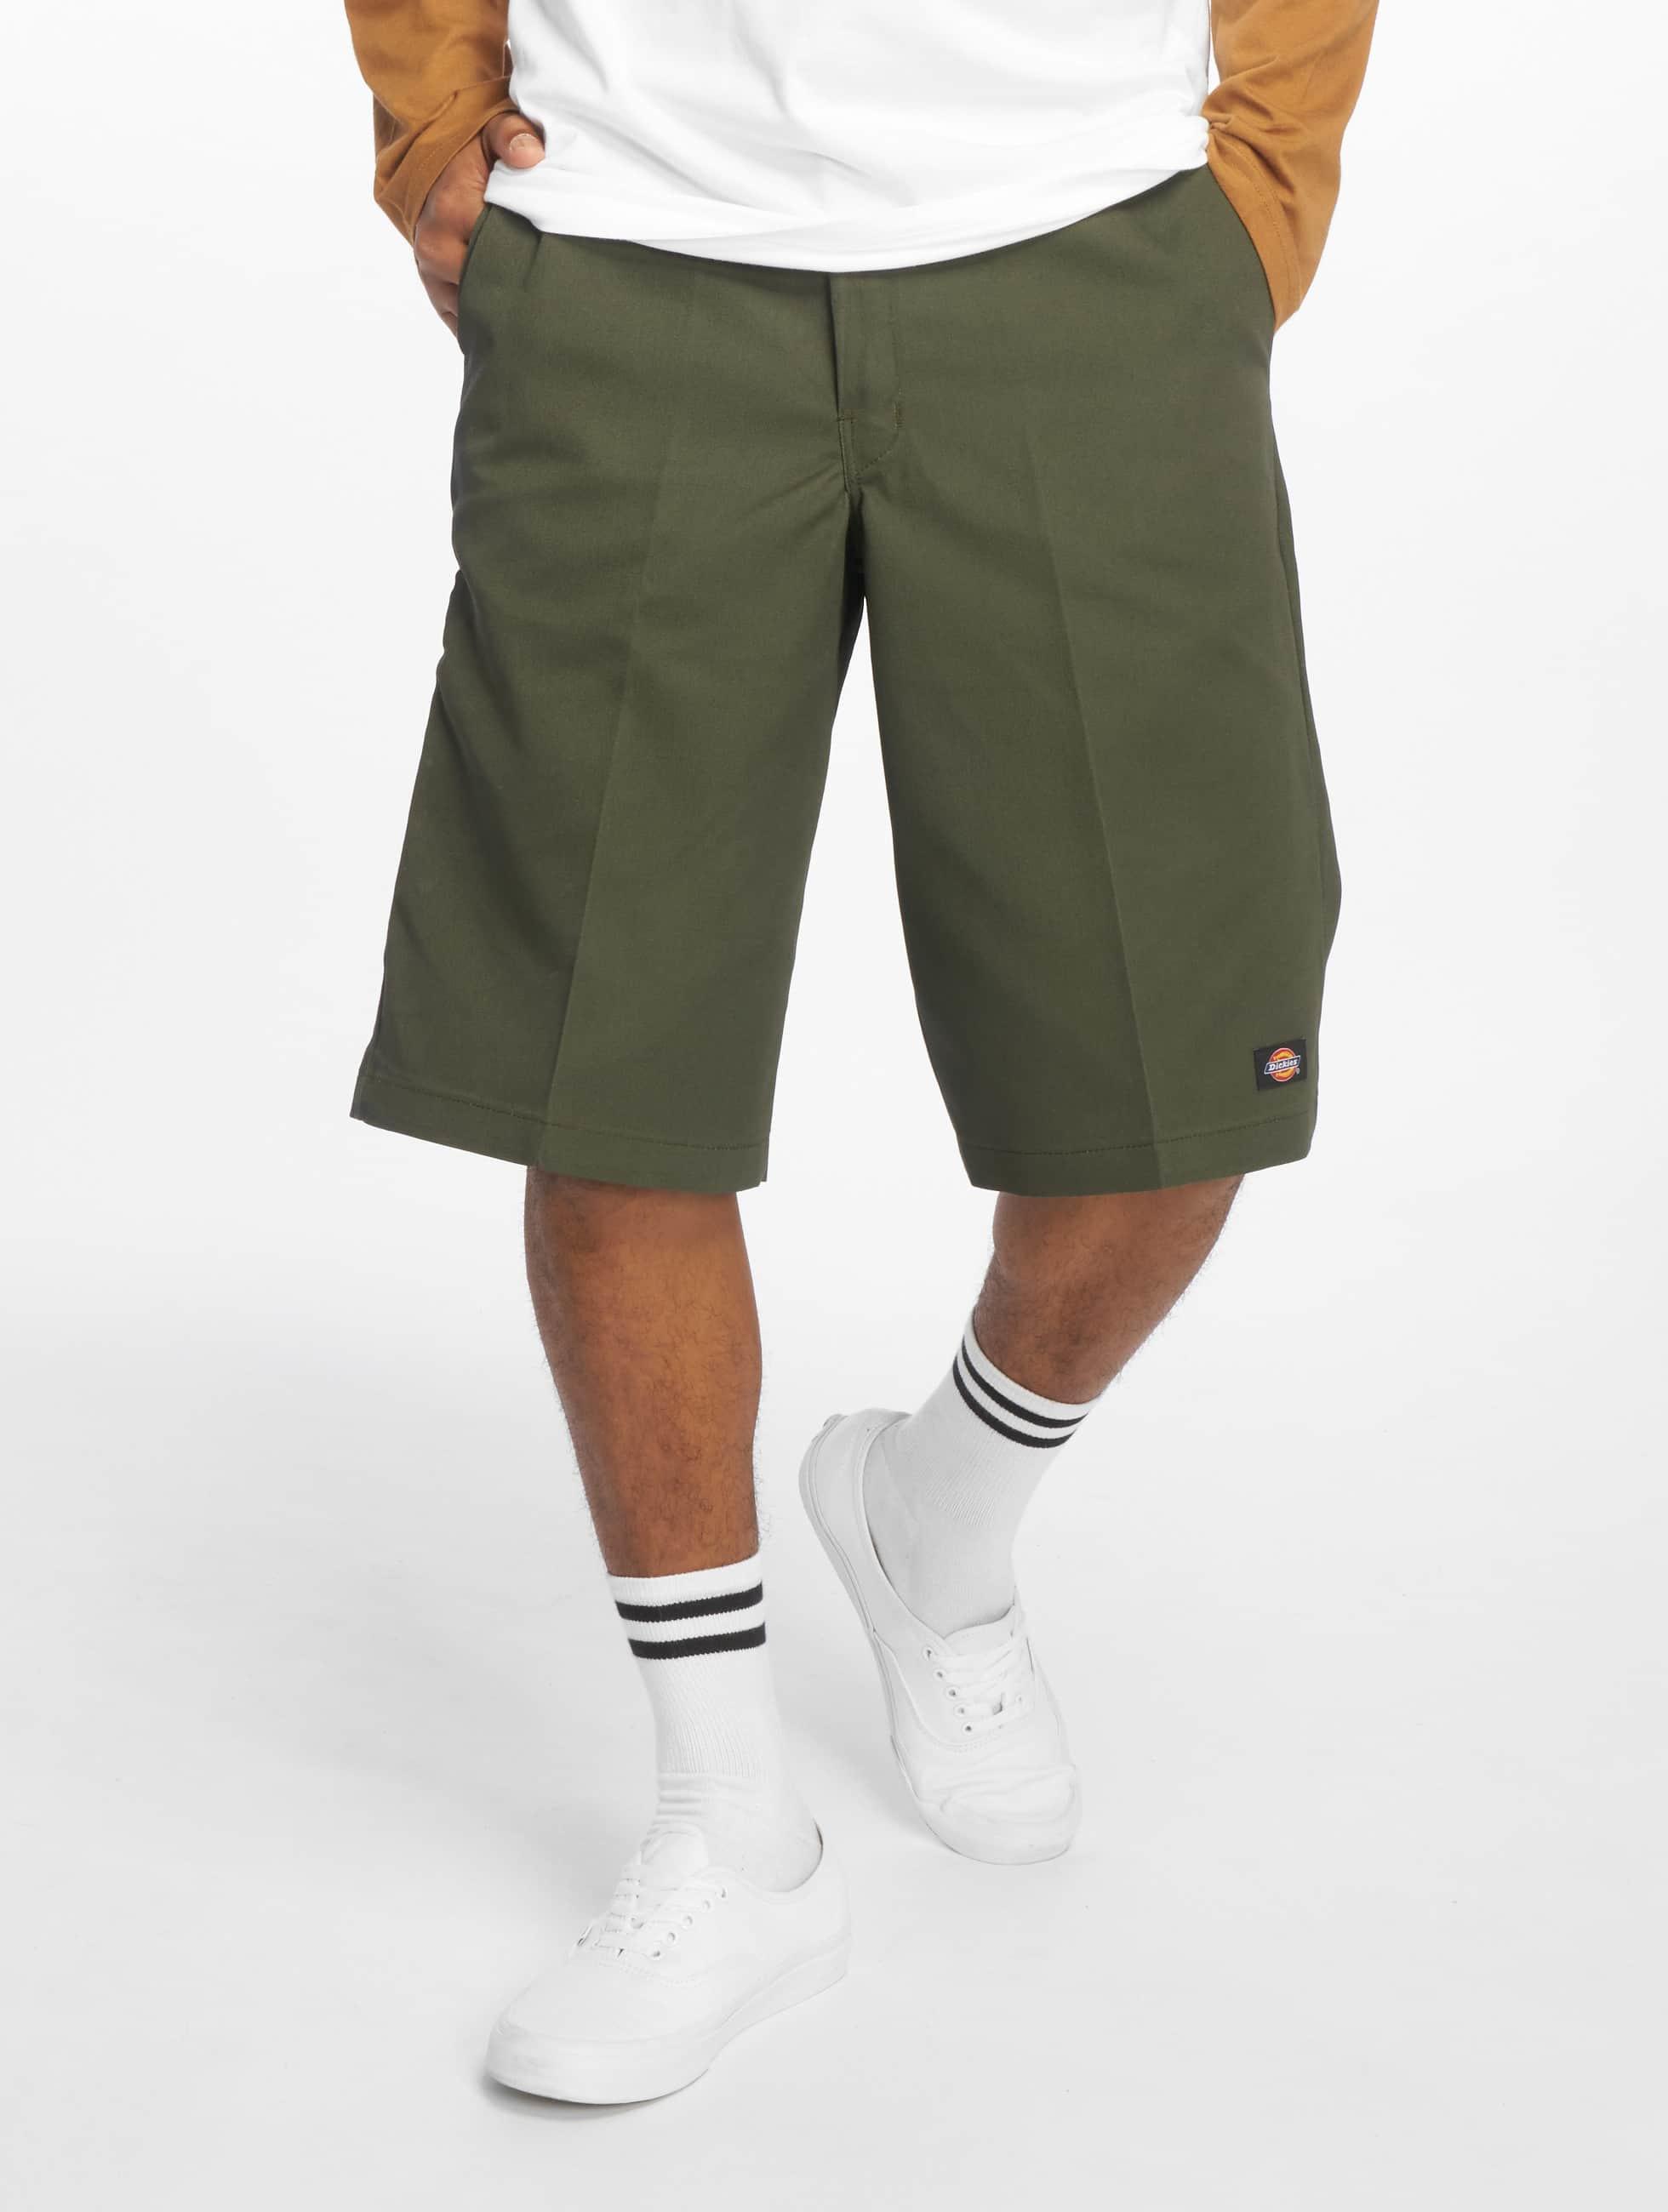 "Dickies Shorts ""13"""" Multi-Use Pocket Work"" olive"